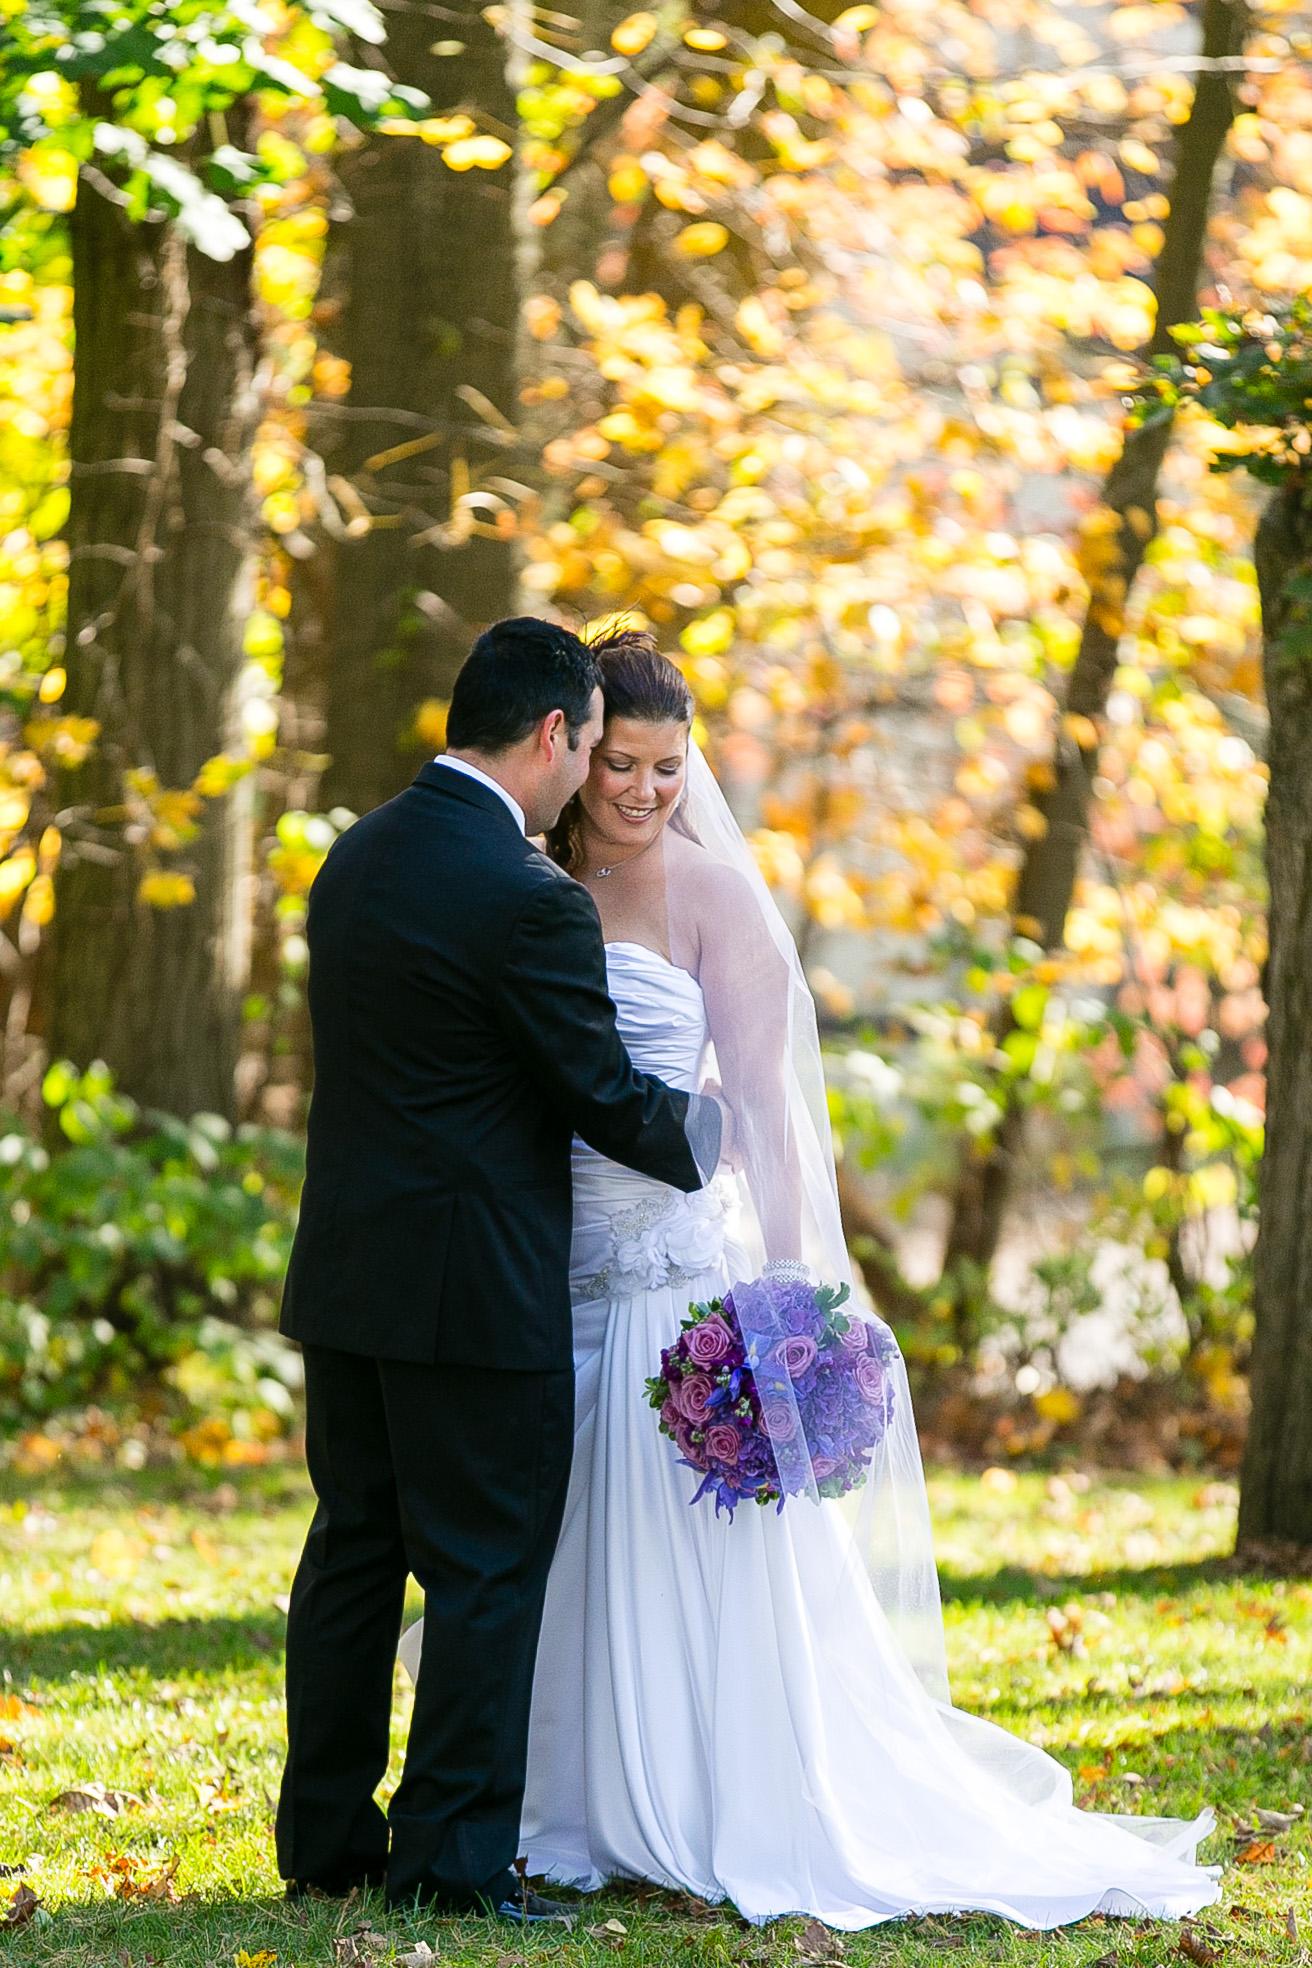 Photo-Journalistic-Wedding-Photography-by-Jacek-Dolata-CT-MA-RI-NJ-NYC-NY-VT-NH-PA-9.jpg